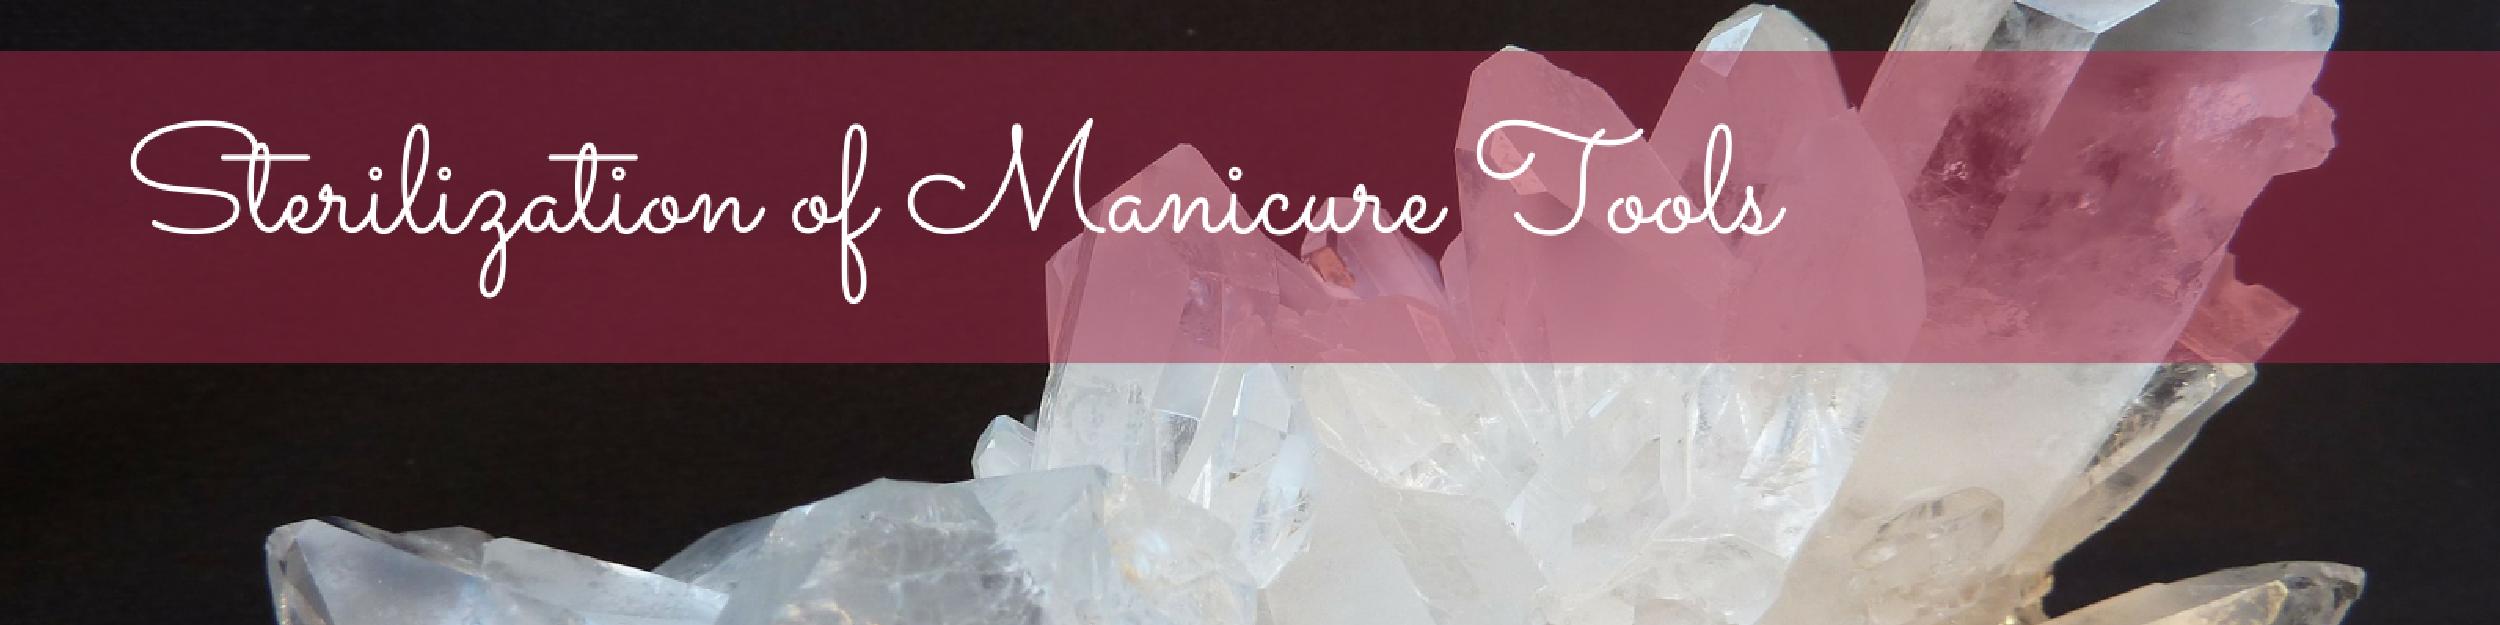 Sterilization of Manicure Tools